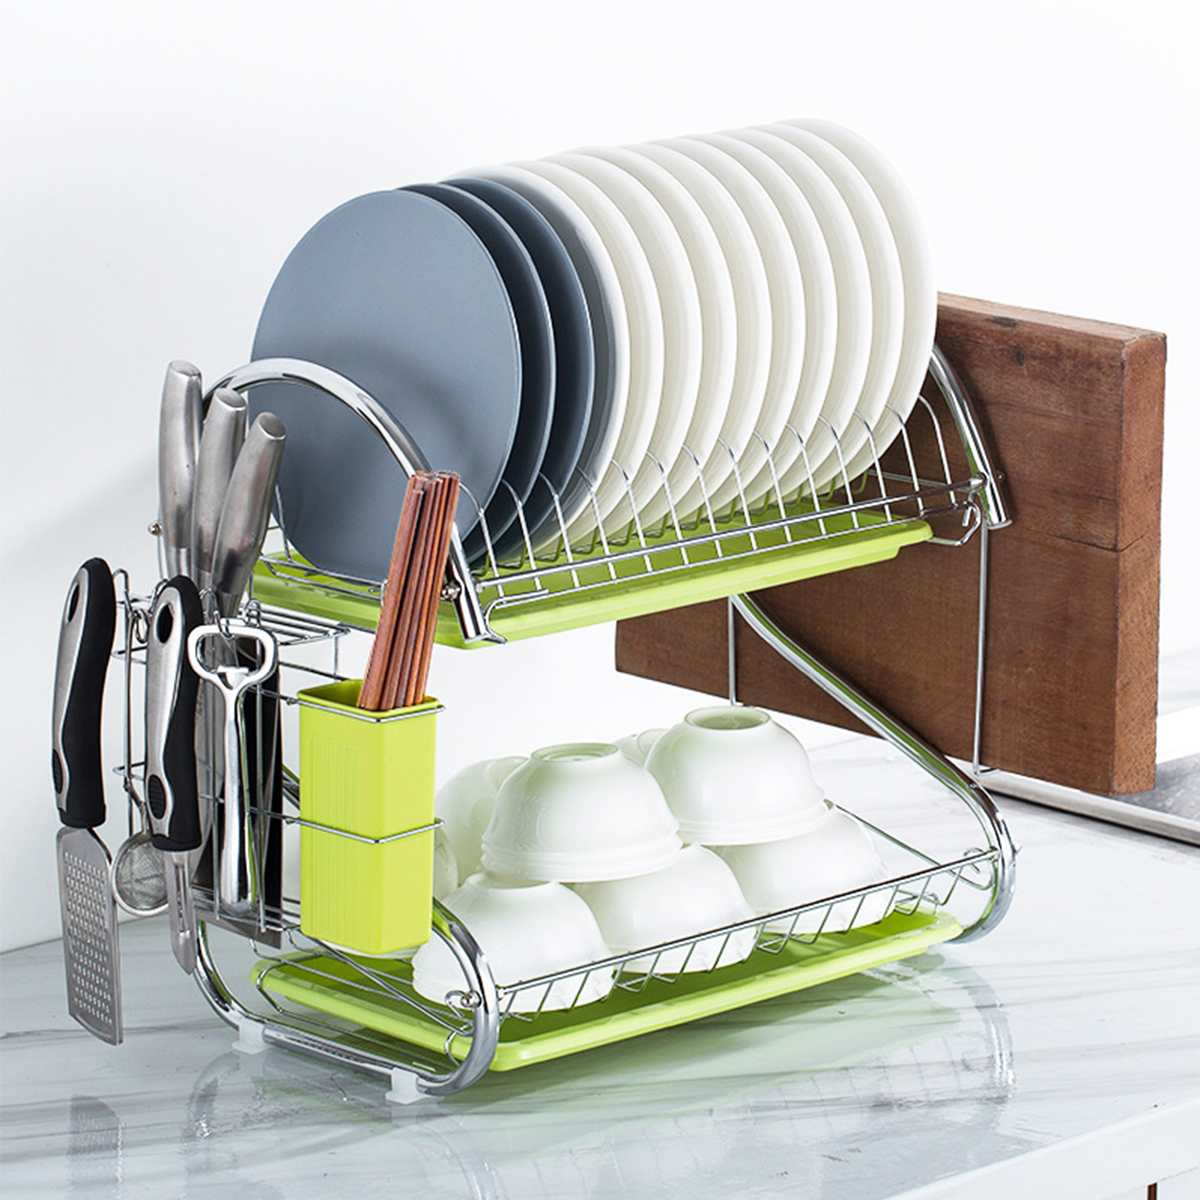 Details about  /Kitchen Storage Dish Cup Drying Rack Holder Organizer Drainer Dryer Tray